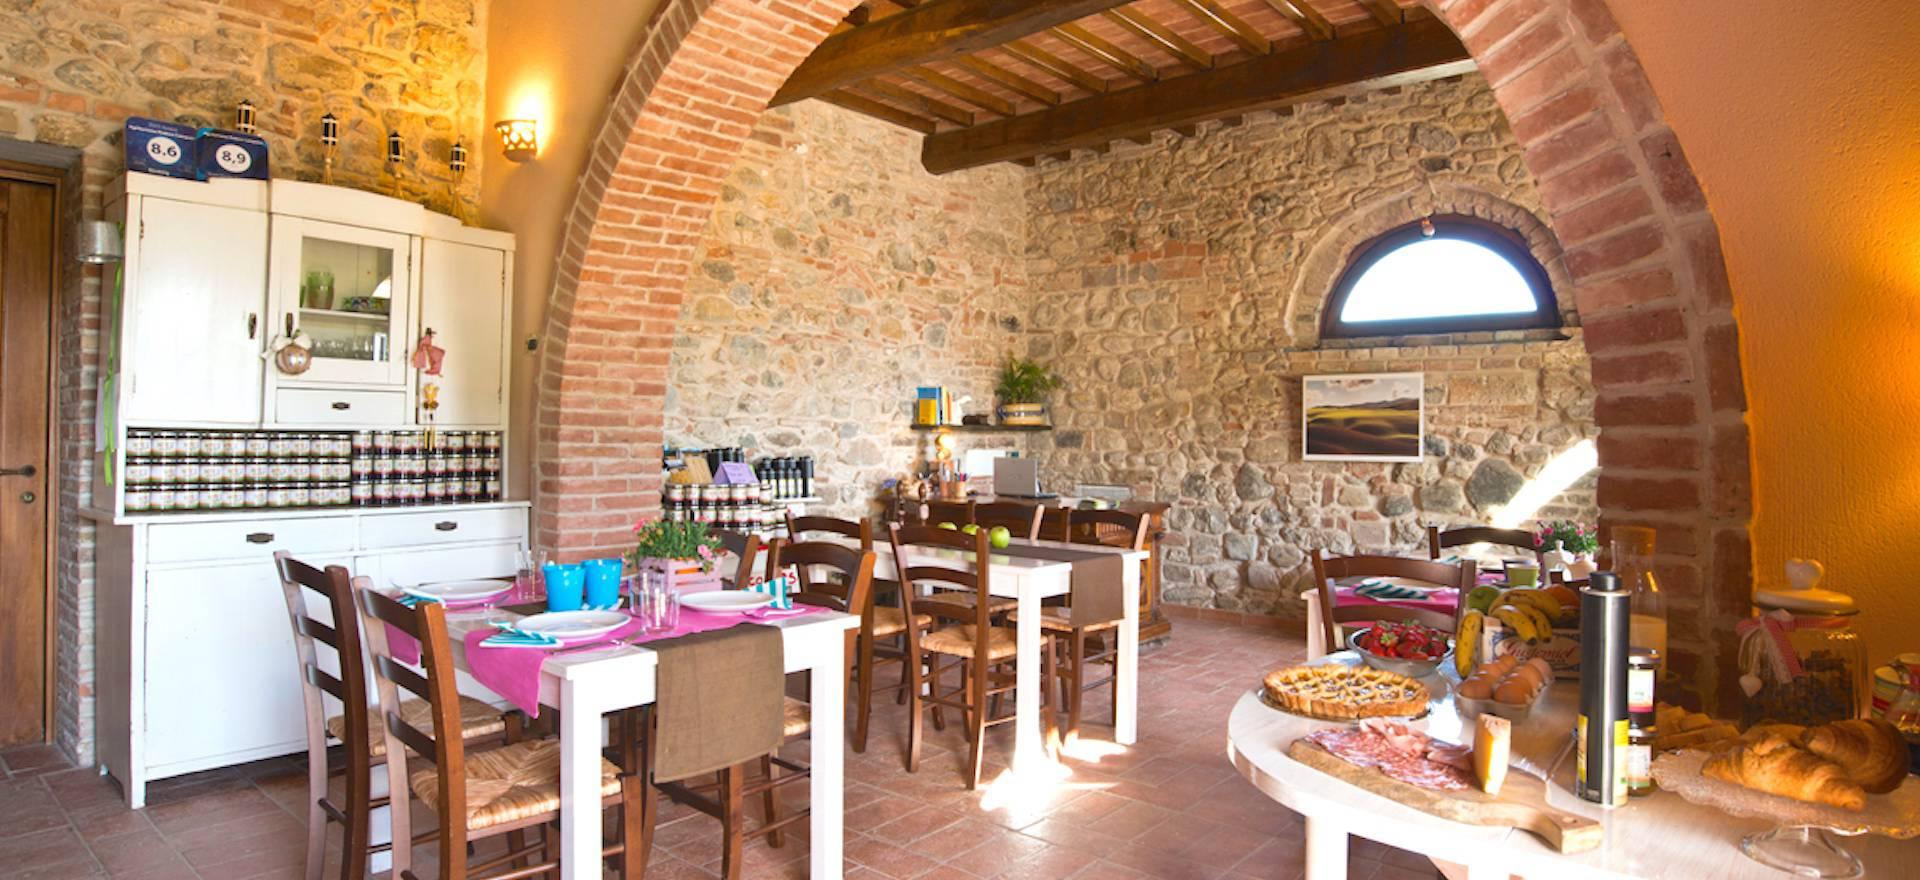 Agriturismo Toscane Agriturismo in Toscane met uitzicht op Volterra